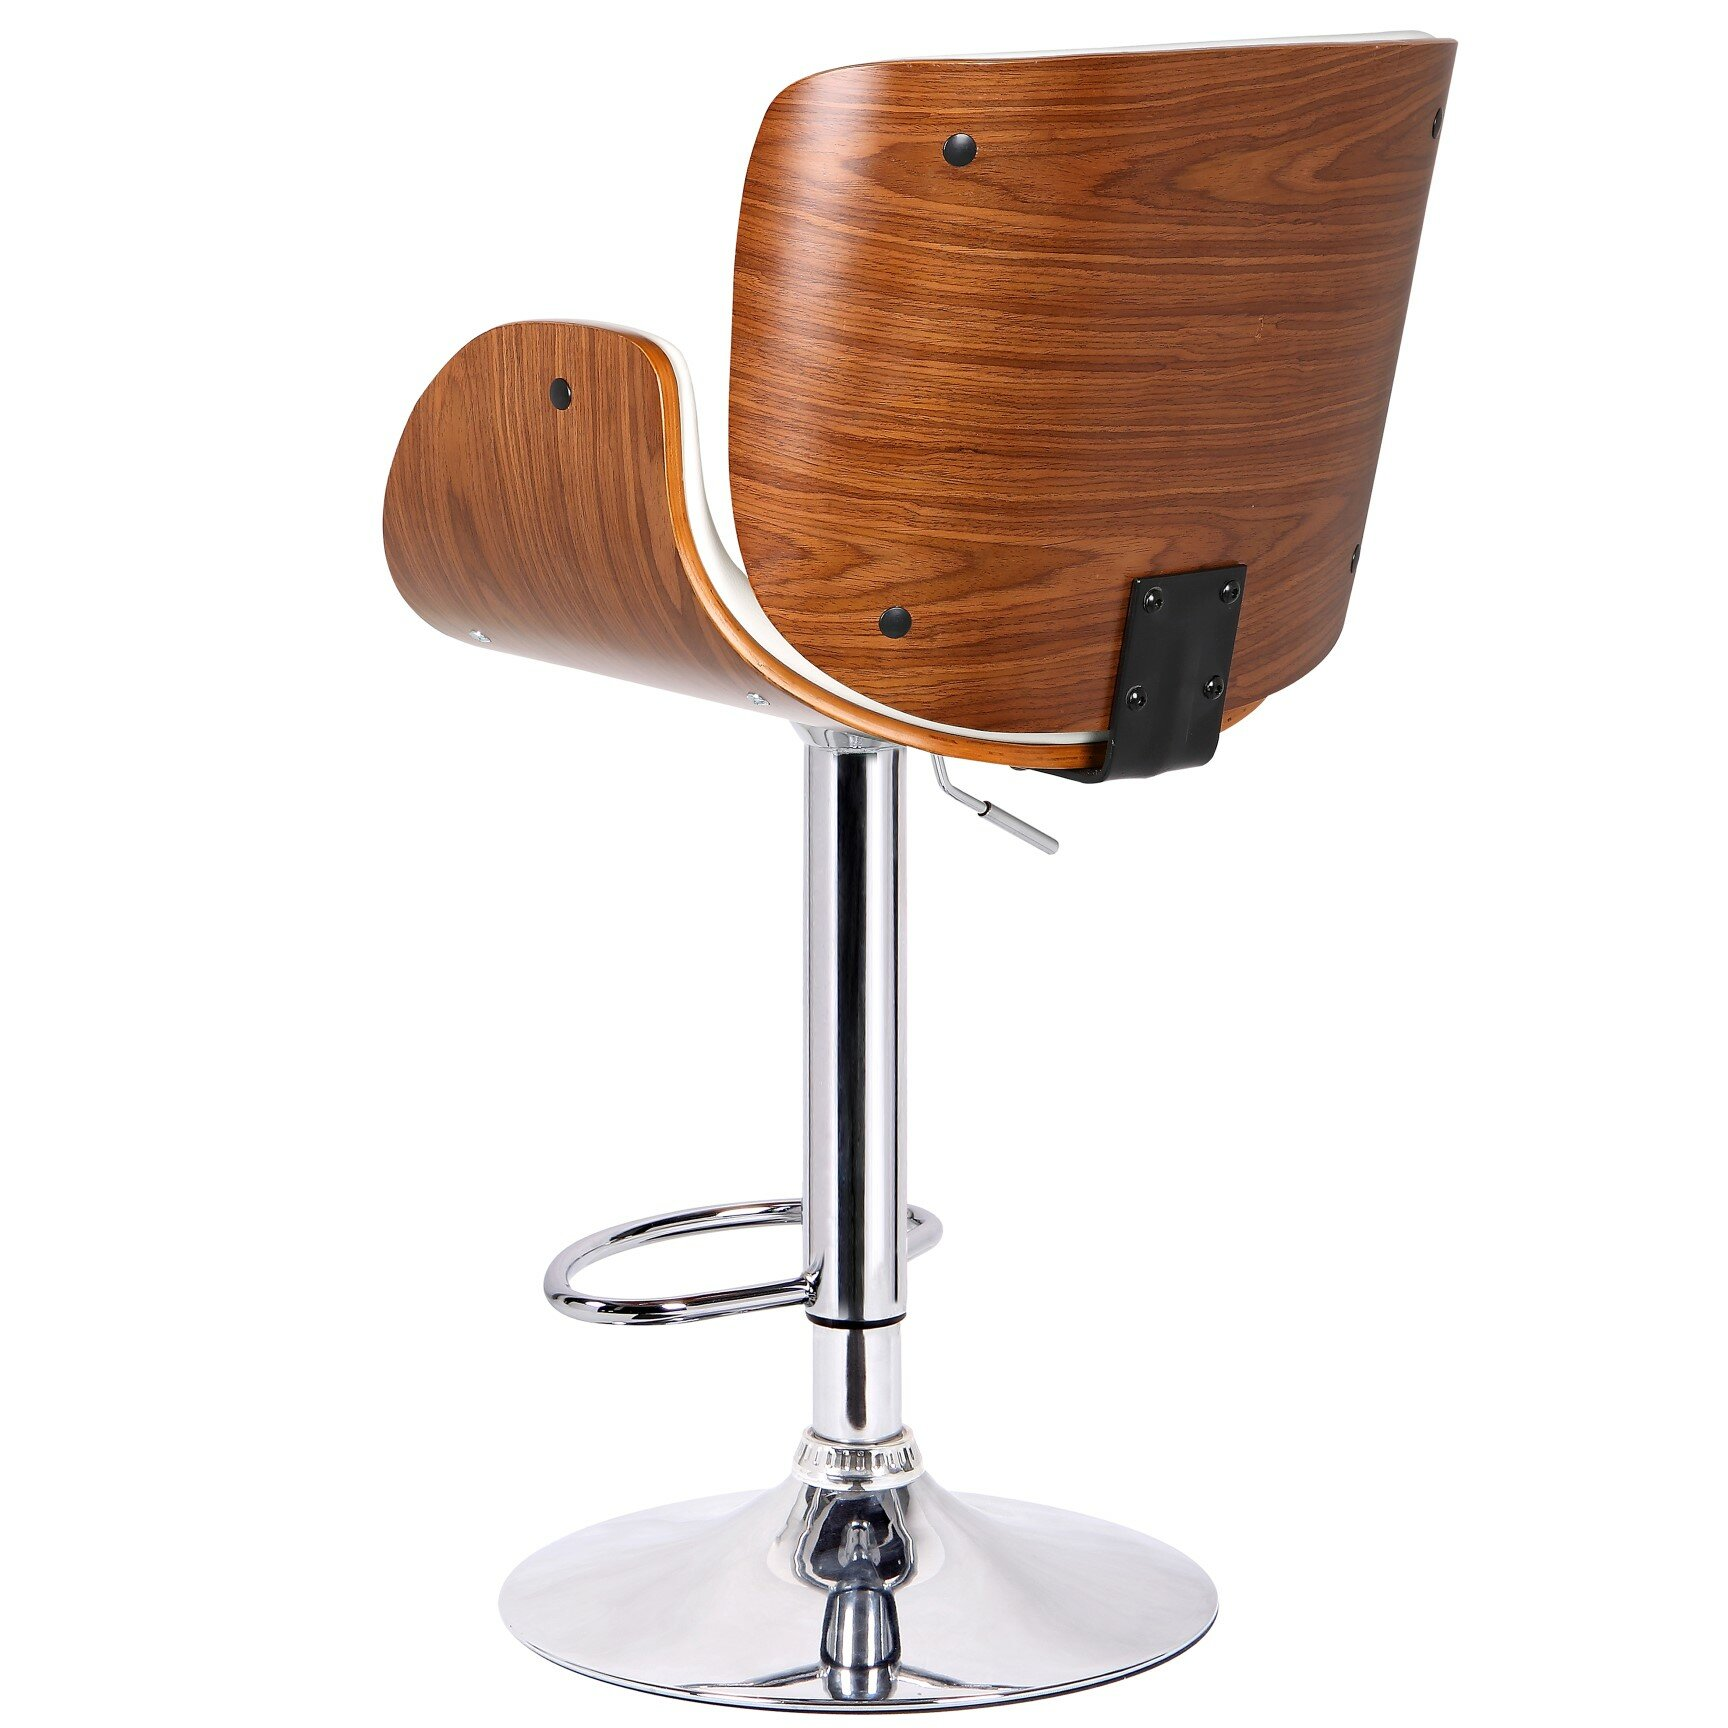 Porthos home adjustable height swivel bar stool reviews for Adjustable height bar stools